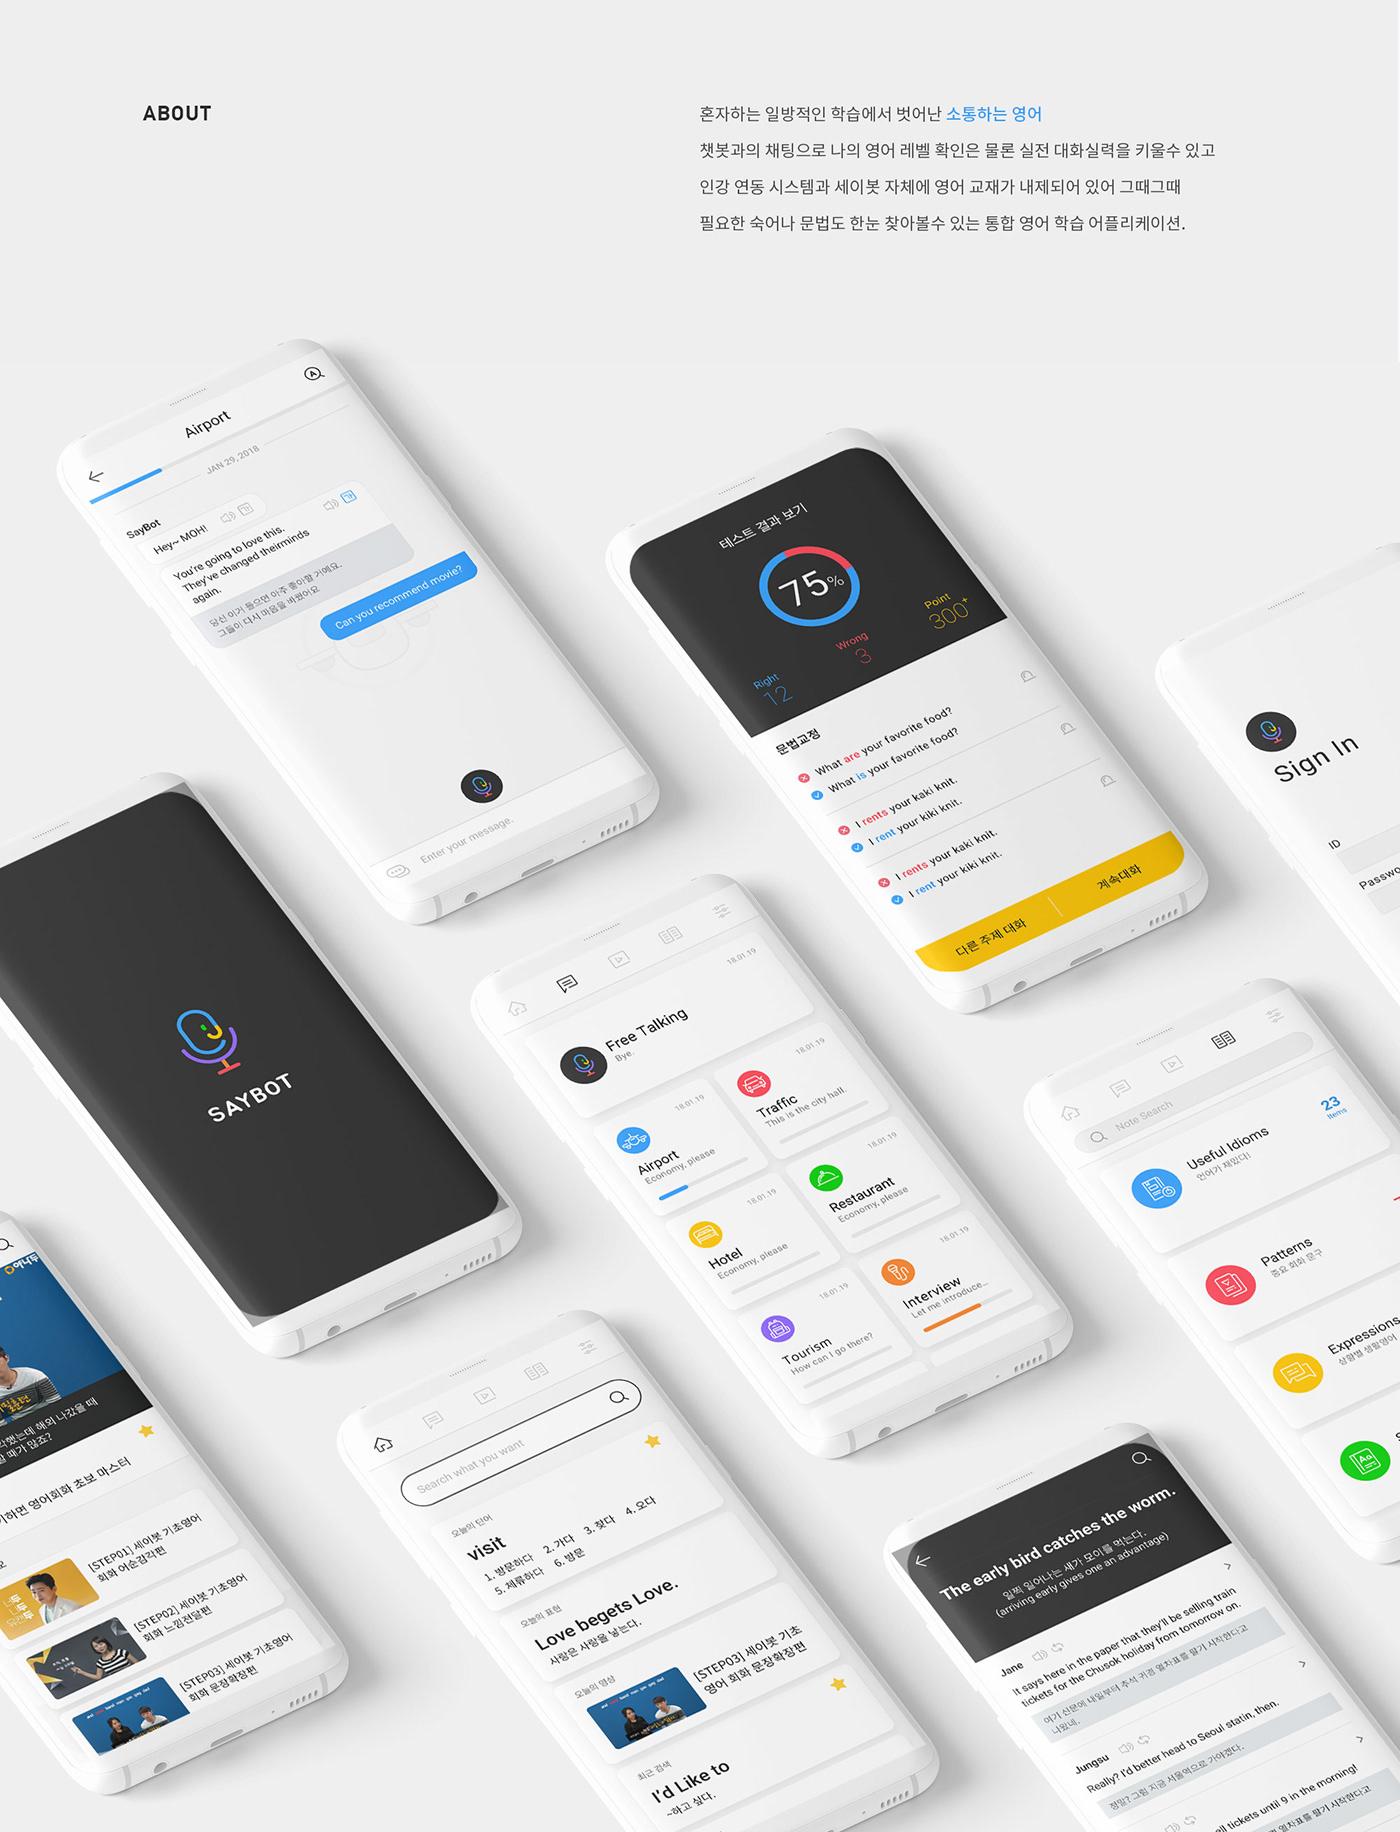 Saybot App - Study English with AI Chatbot on Behance